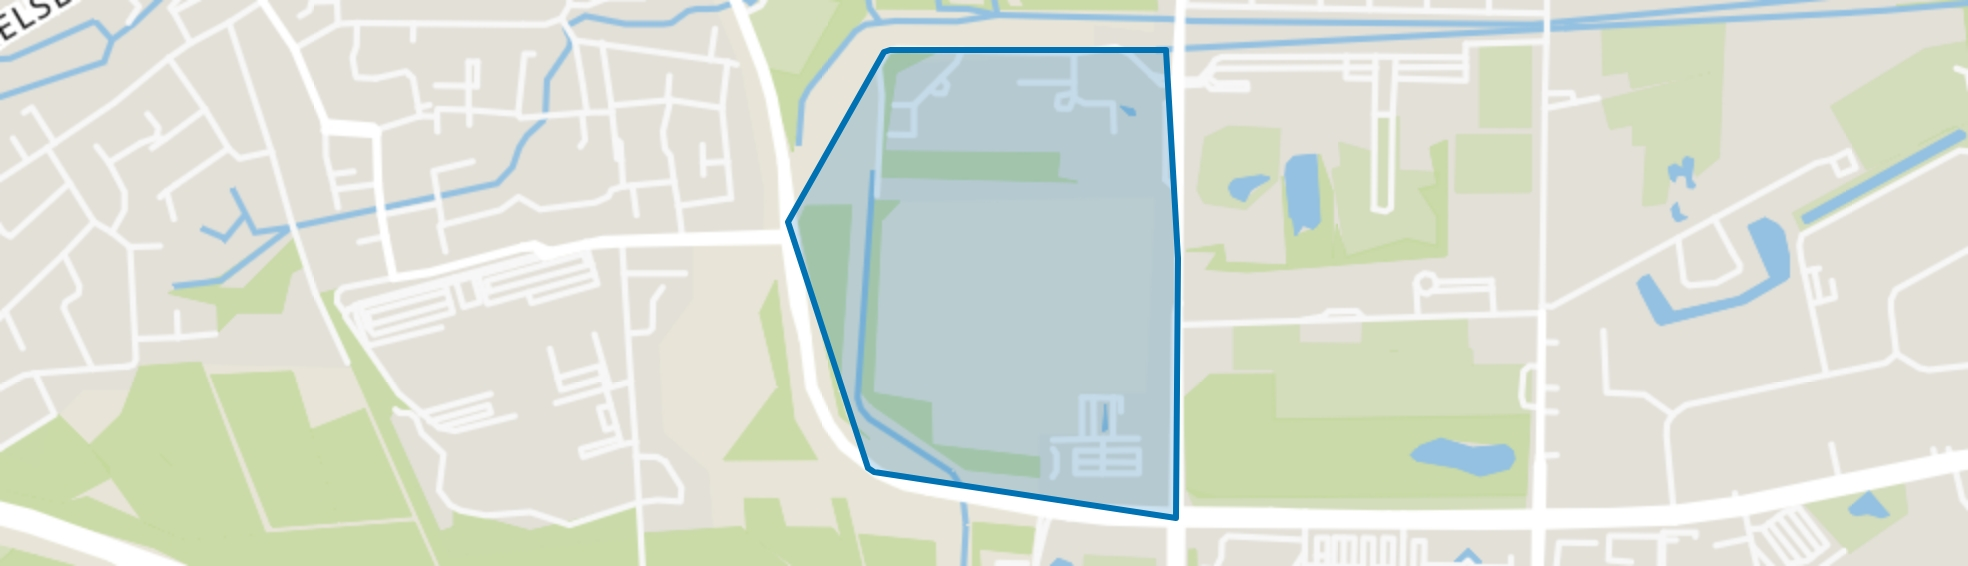 Wernem, Apeldoorn map